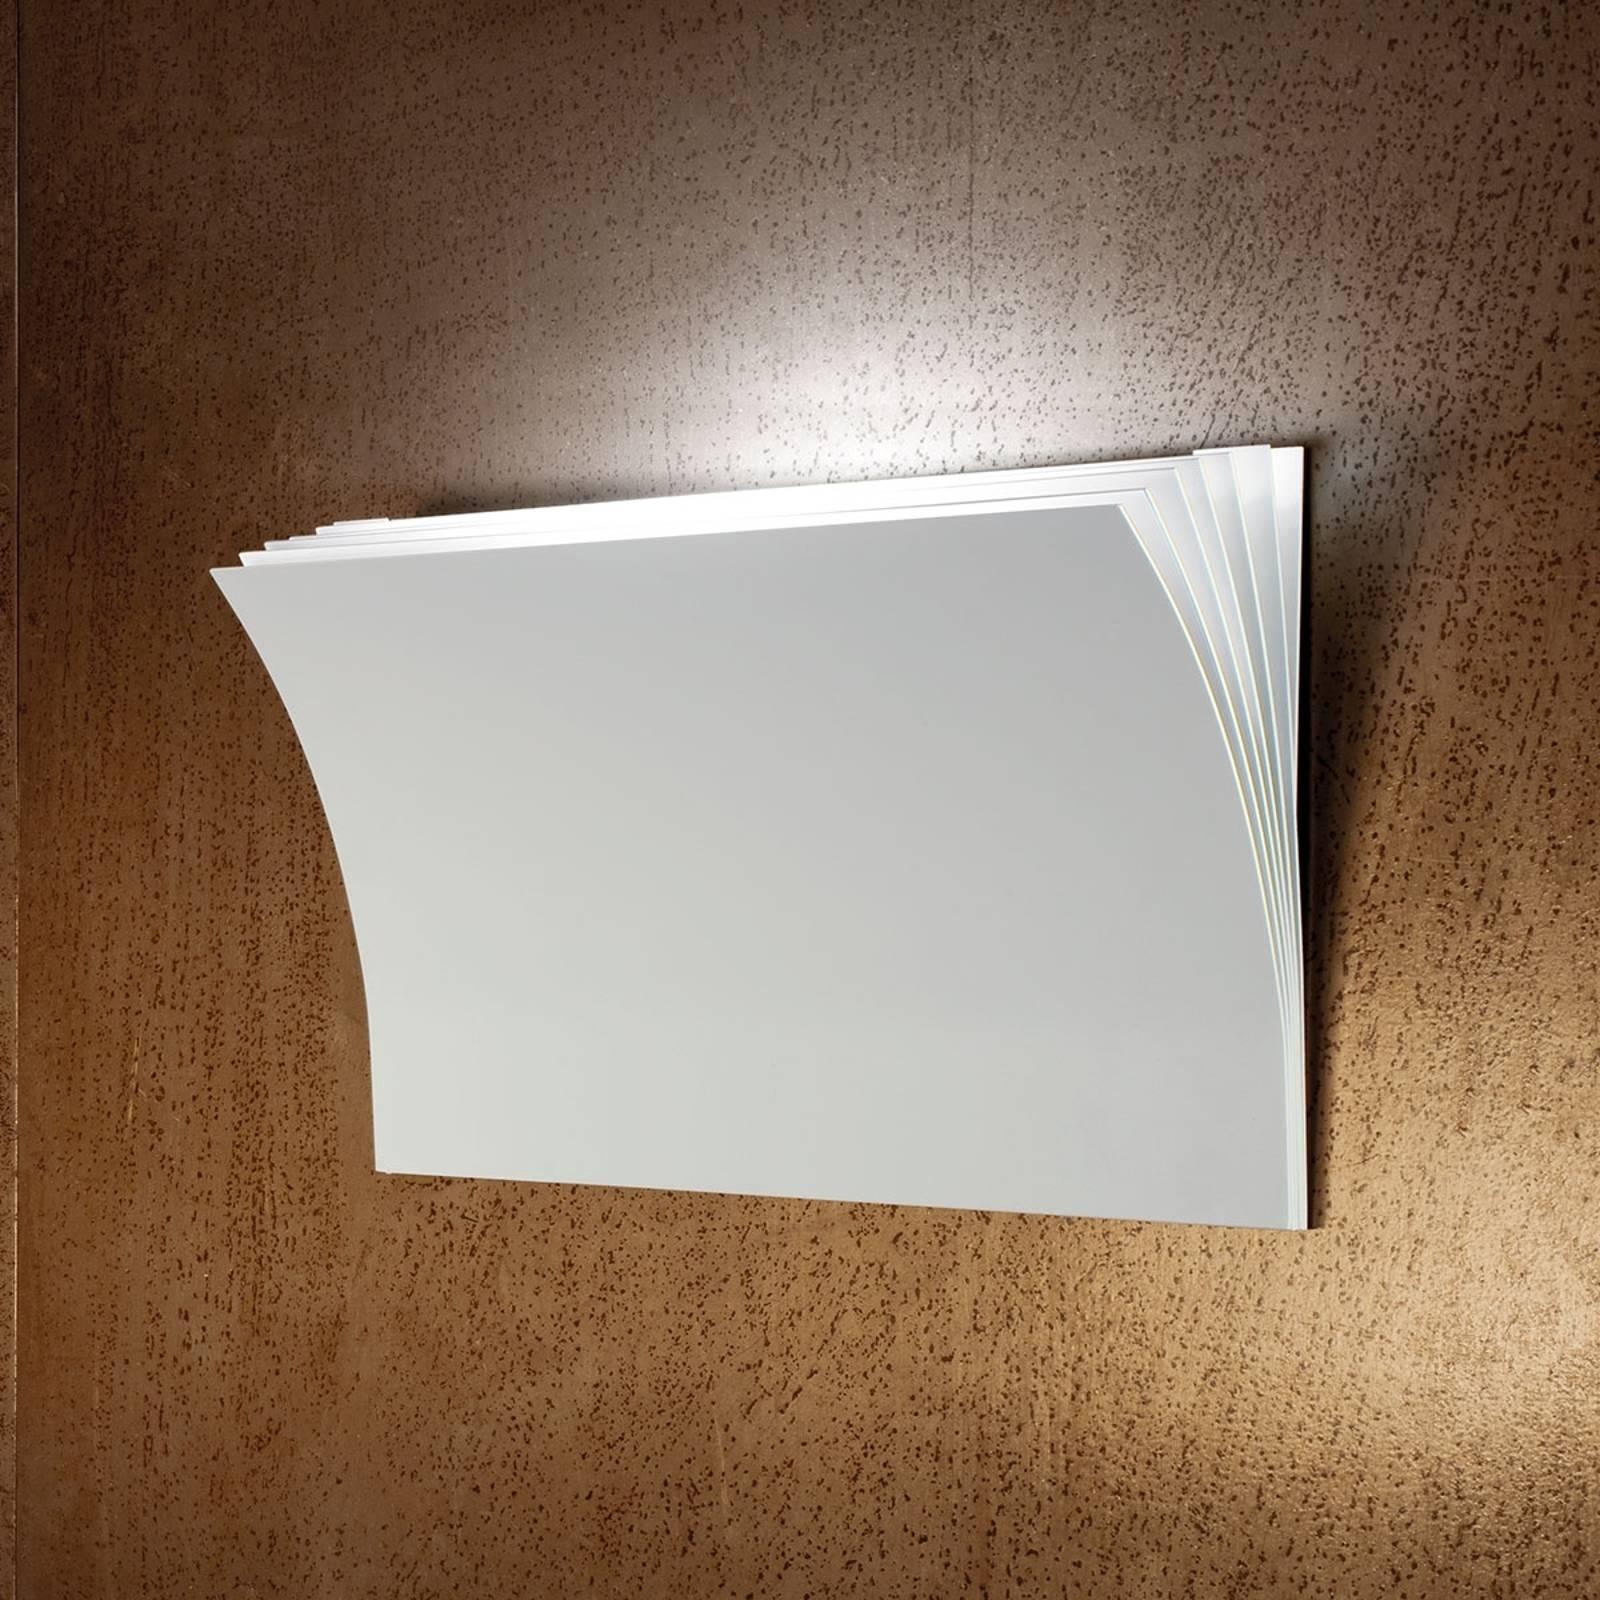 Axolight Polia LED-Wandleuchte in Weiß 45cm